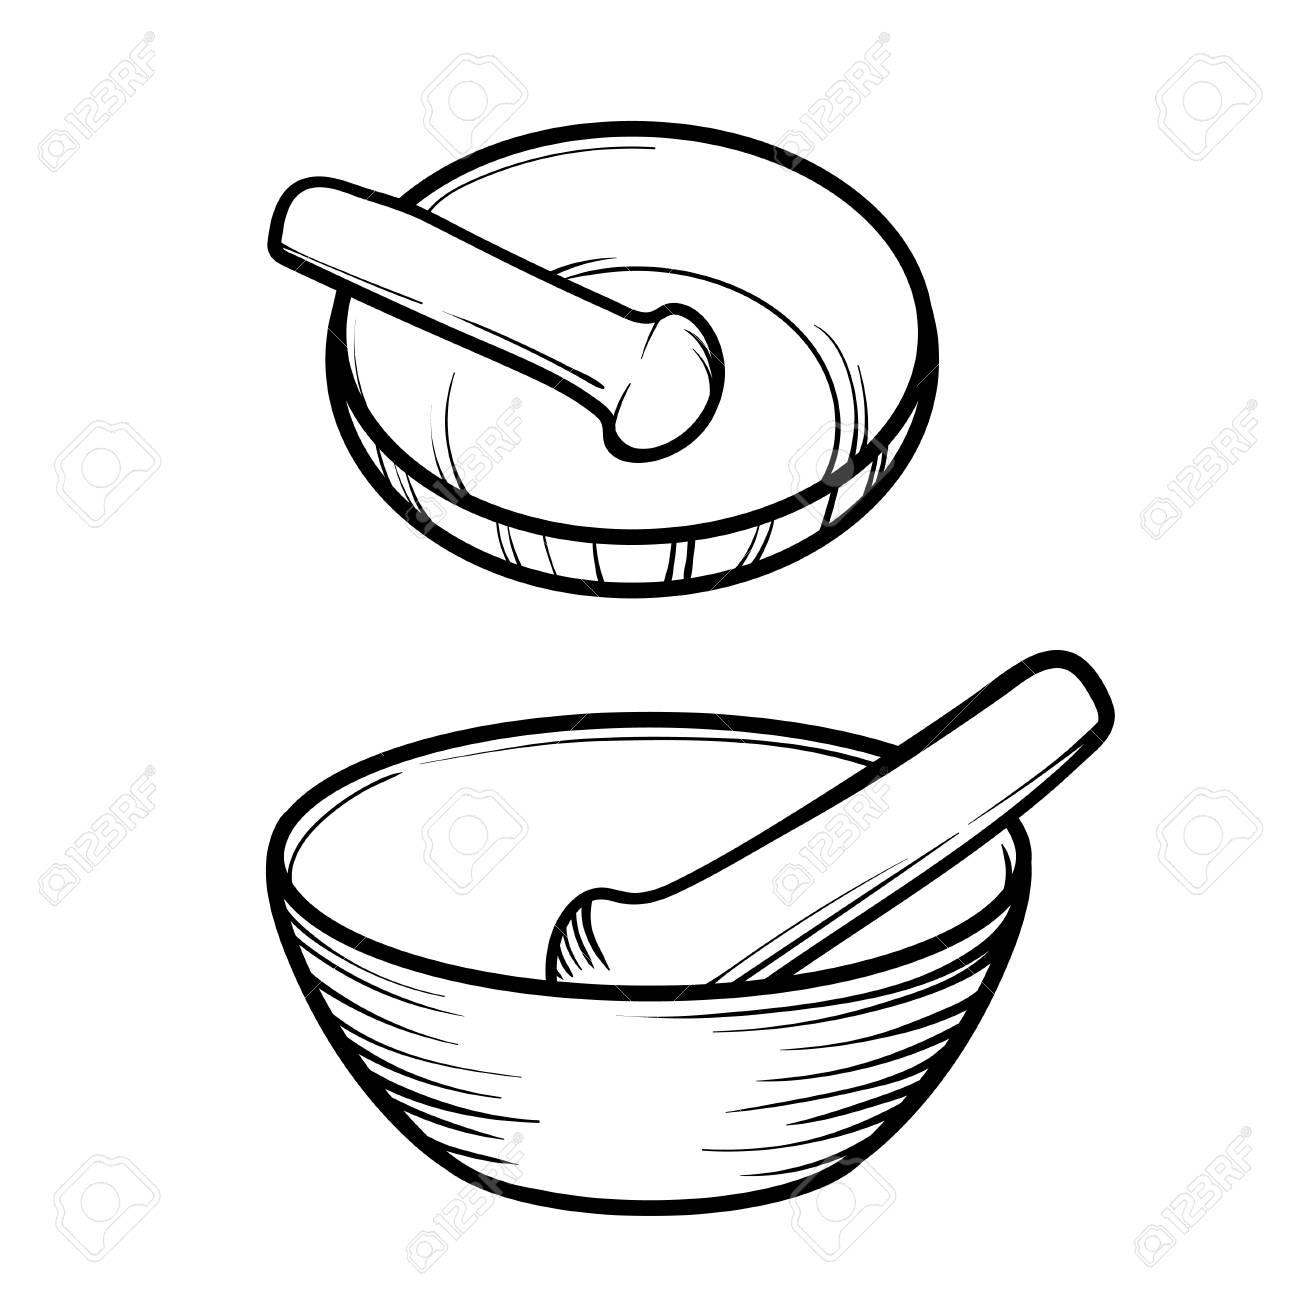 Mortar And Pestle. Linear Logo Illustration. Cooking Utensils ...